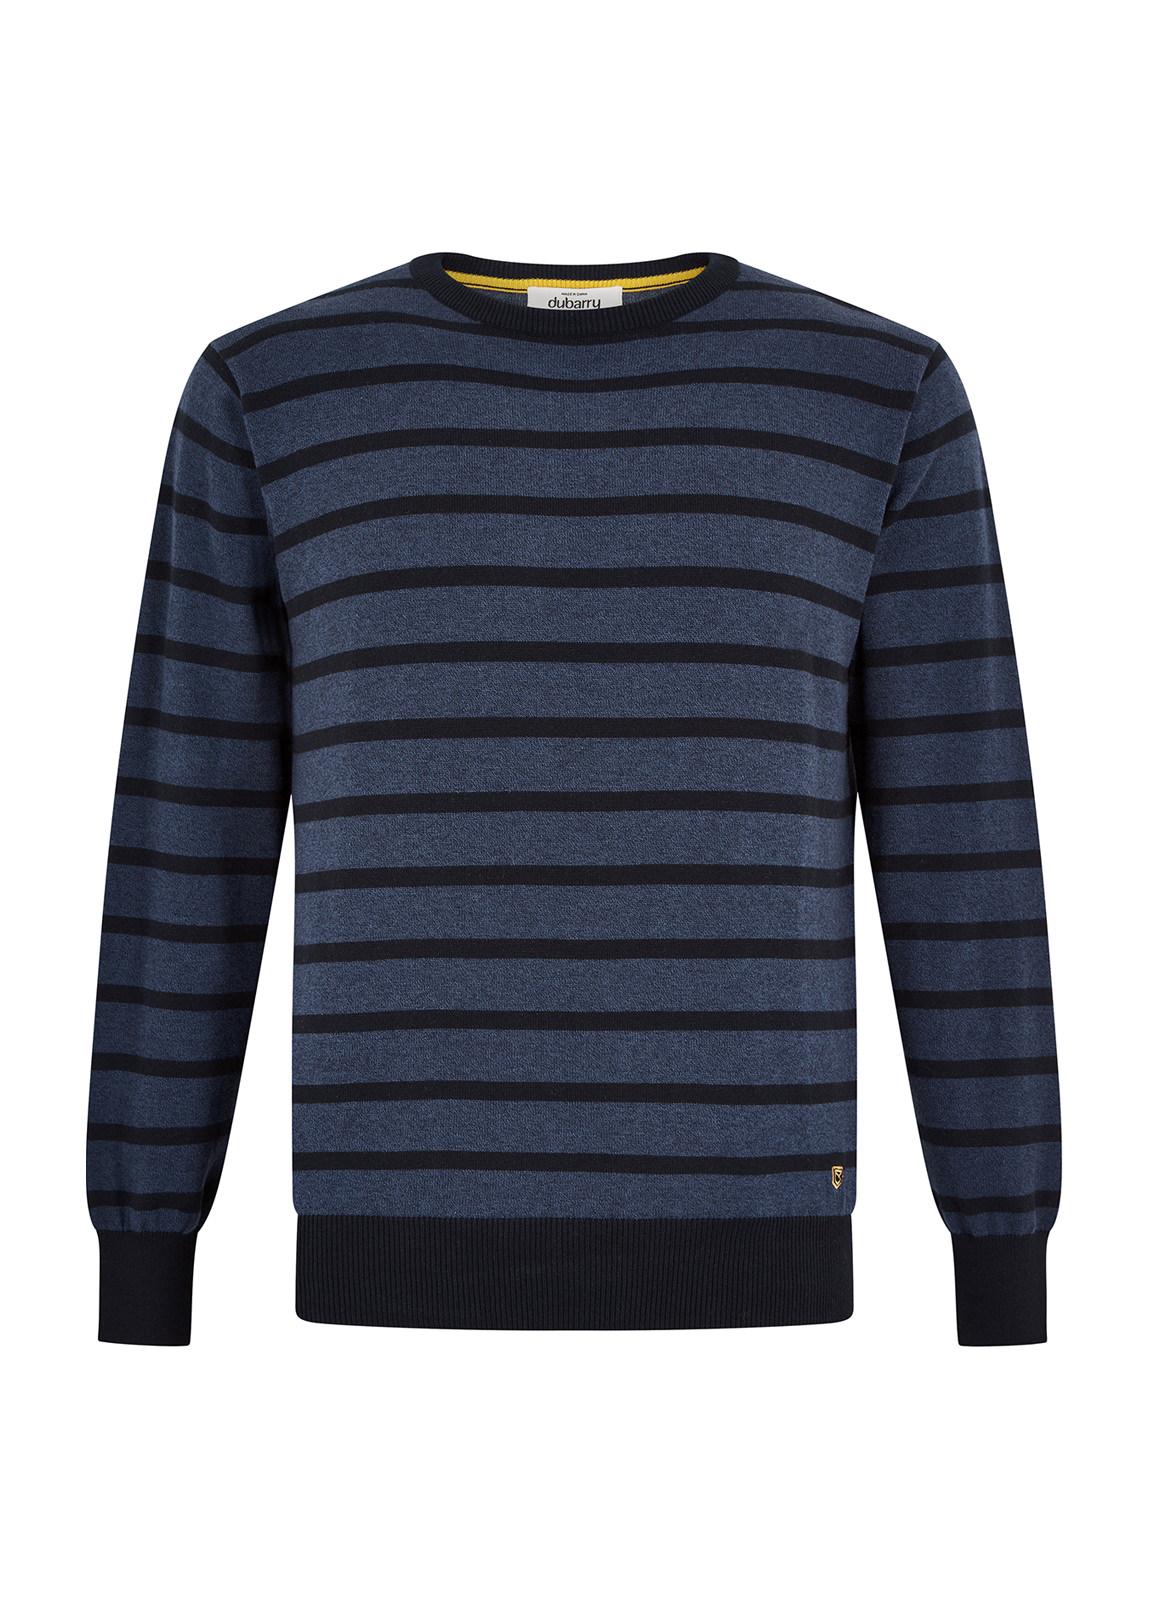 Dubarry_Avondale Sweater - Navy/Bordo_Image_2